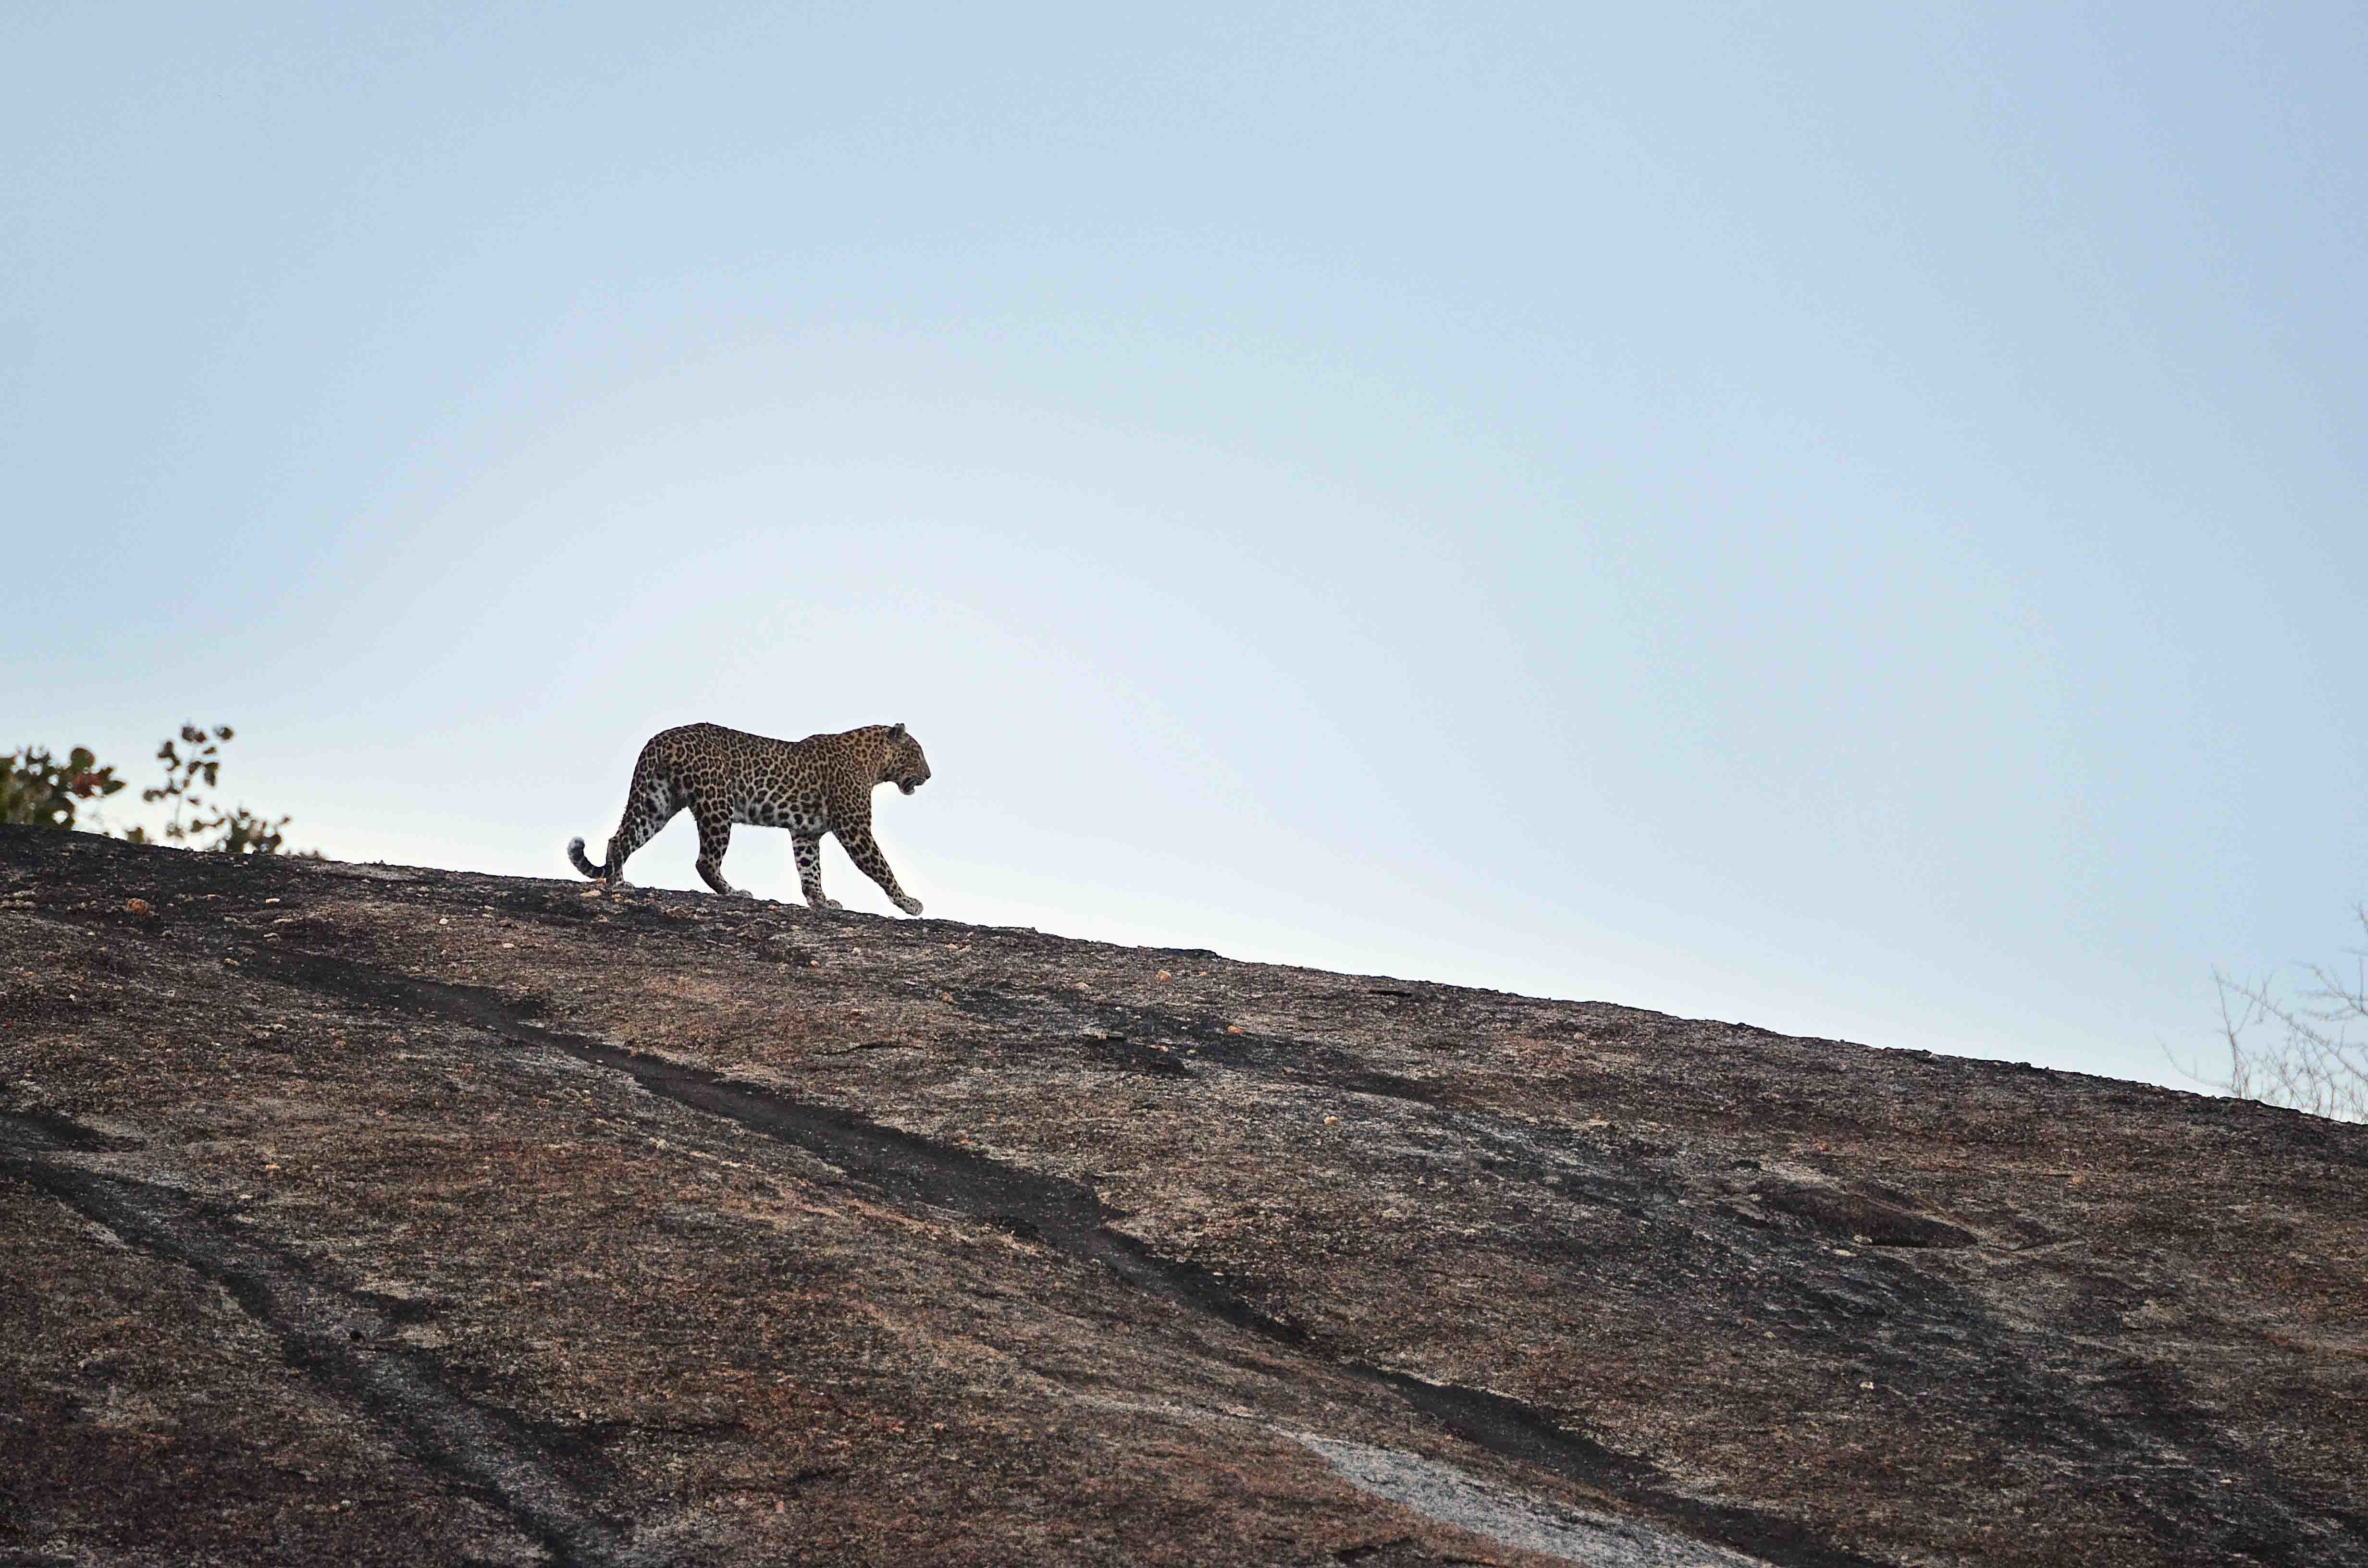 Leoparden hautnah erleben